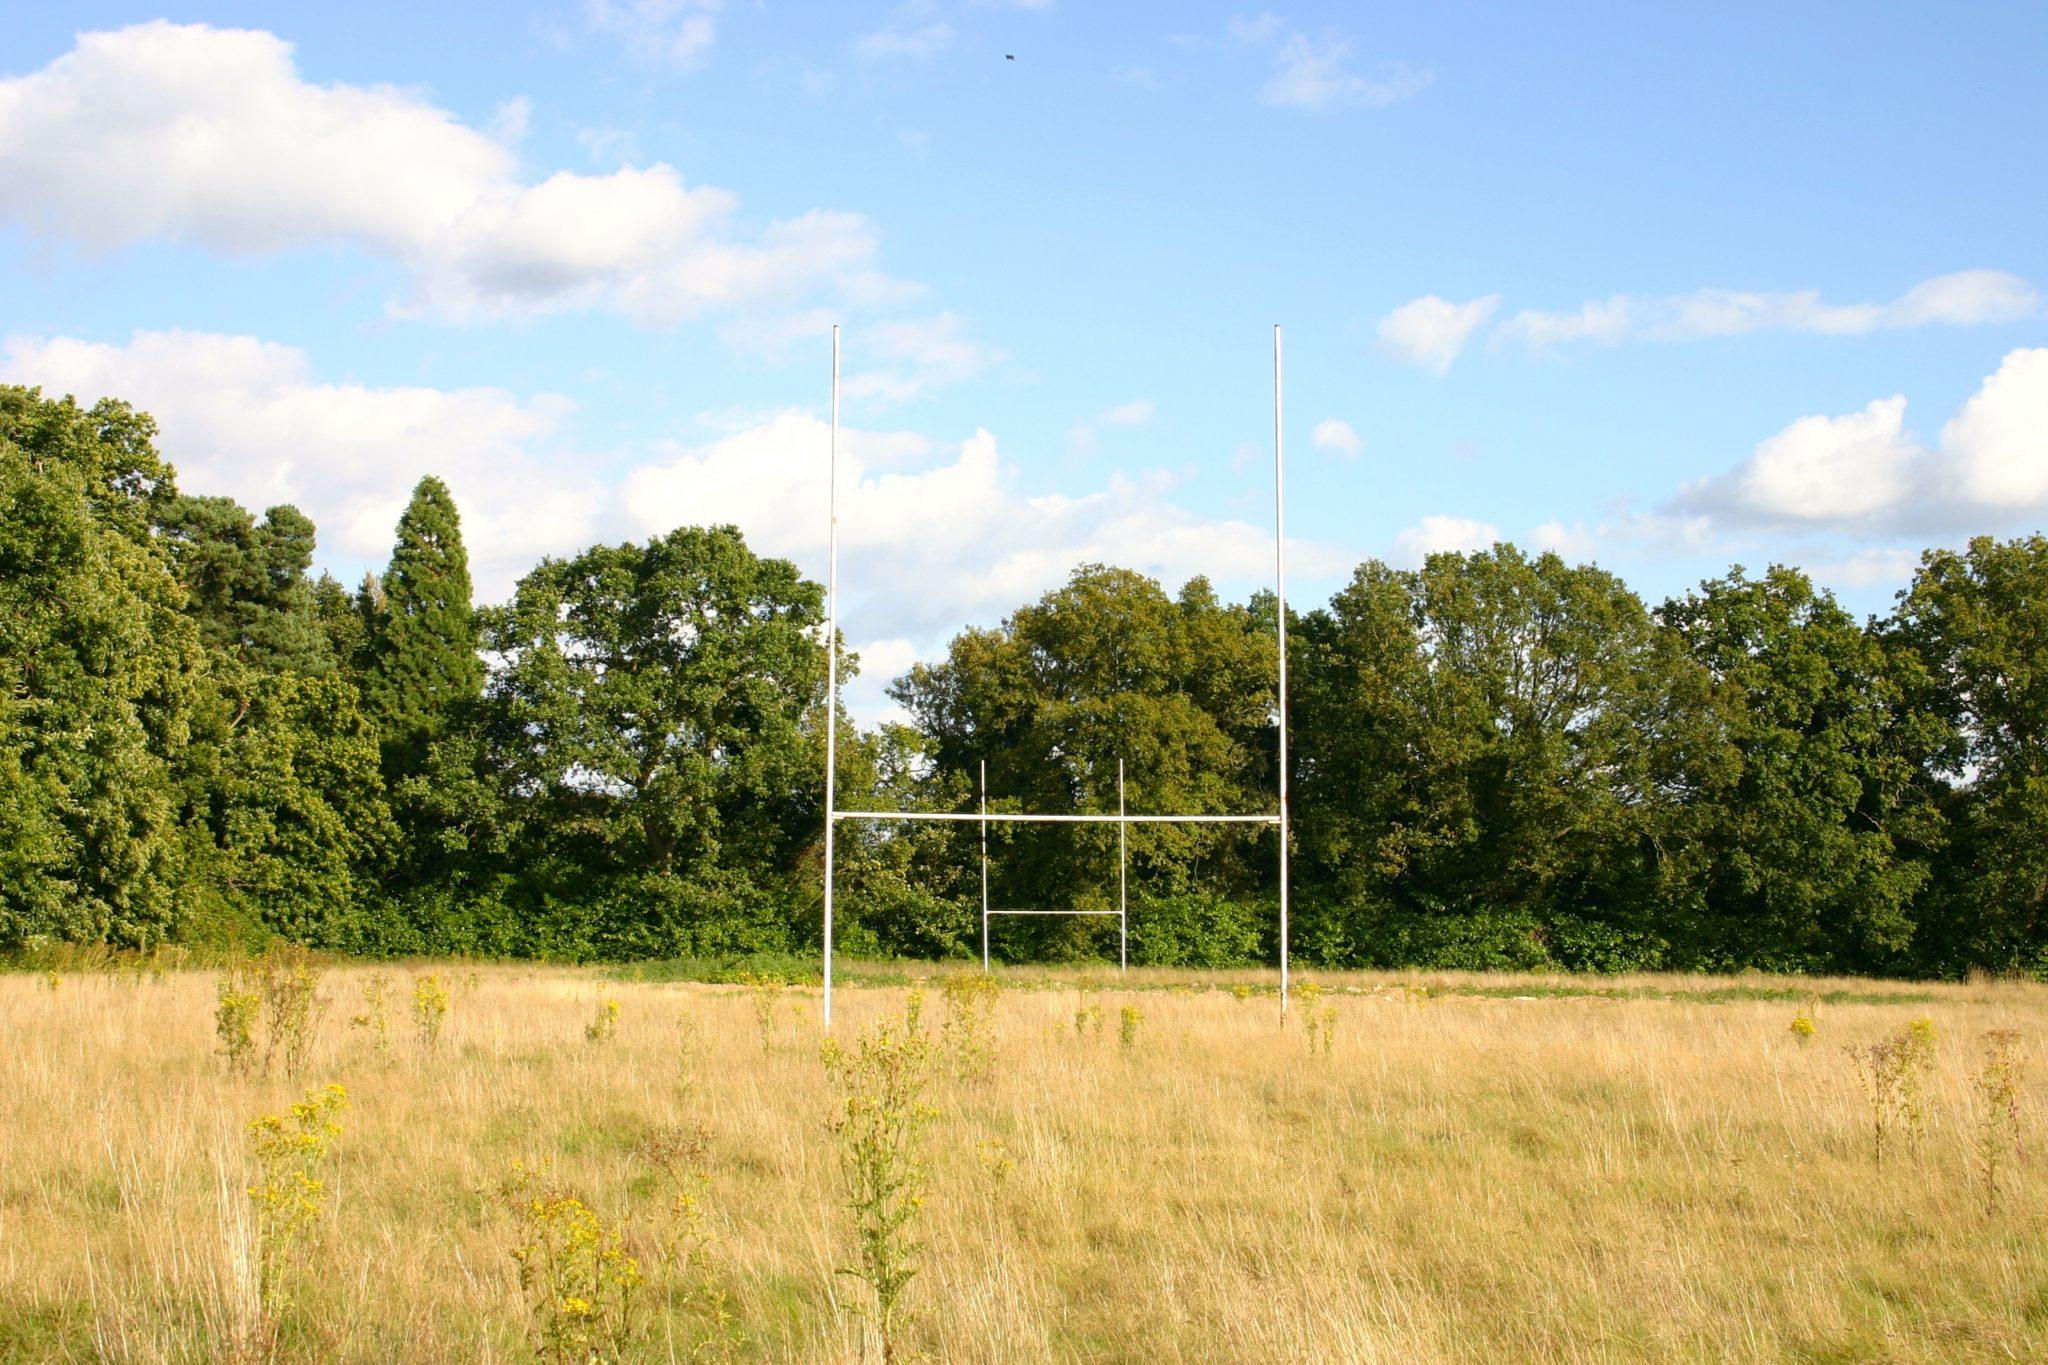 Terrain rugby Ecologie sport Ecolosport